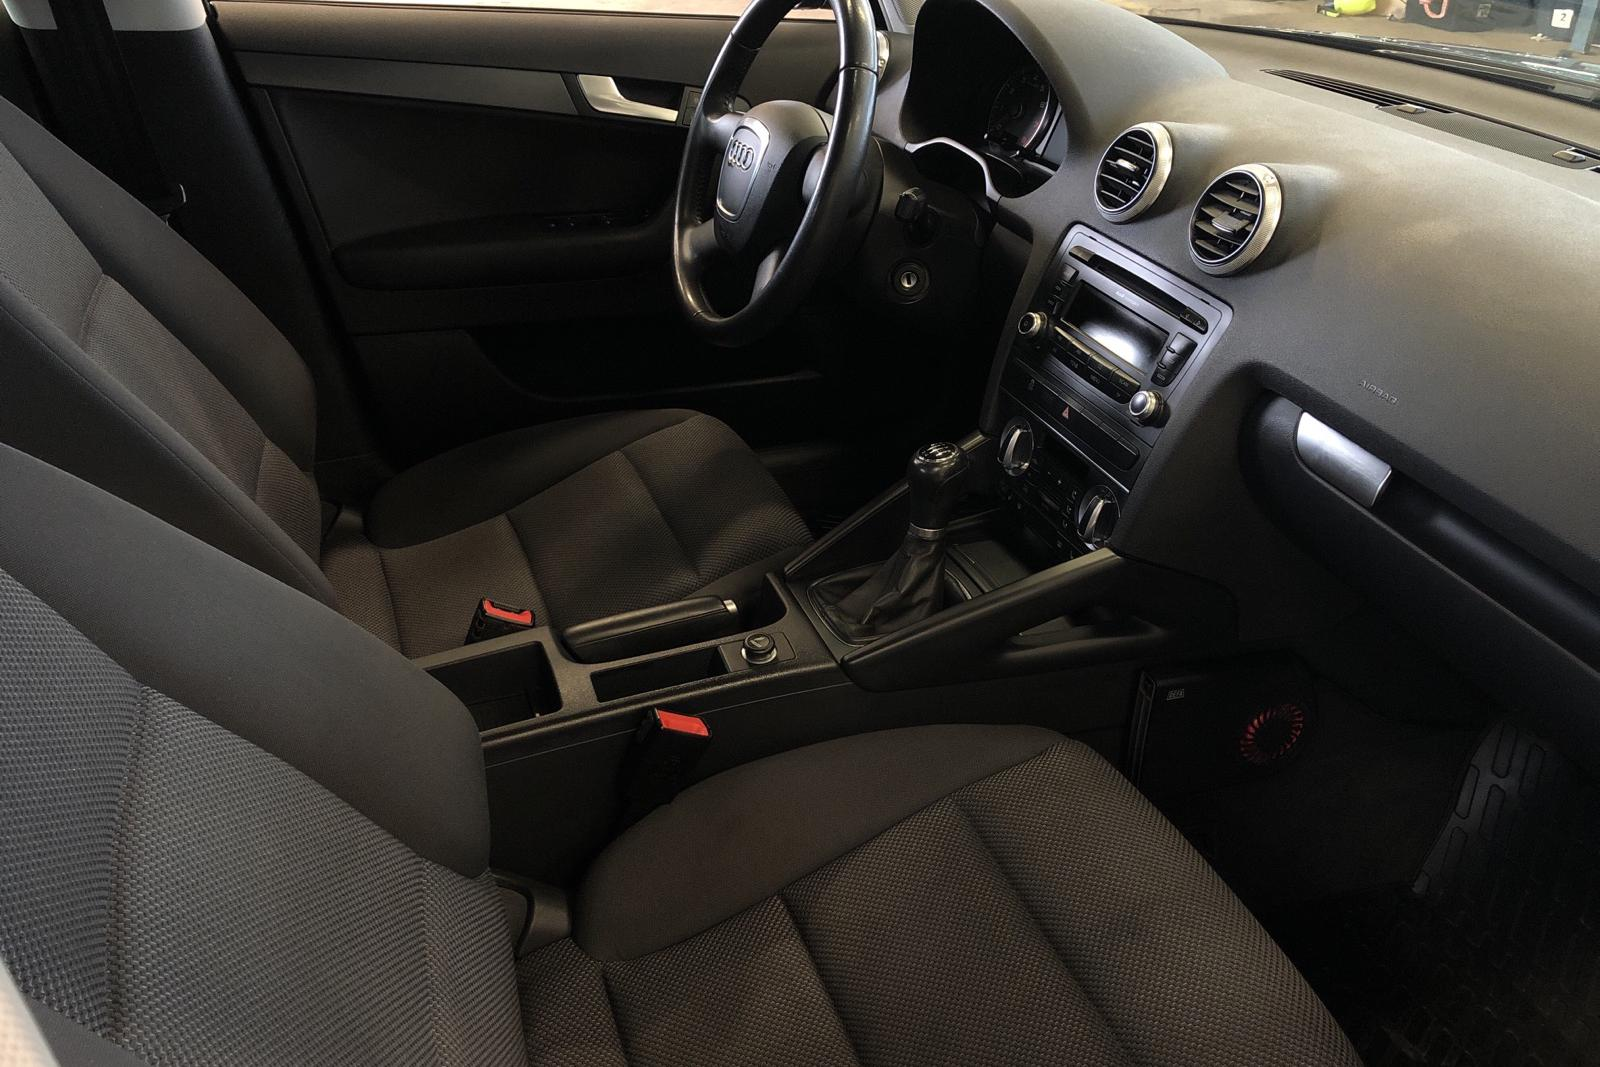 Audi A3 1.6 E85 Sportback (102hk) - 97 860 km - Manual - gray - 2010